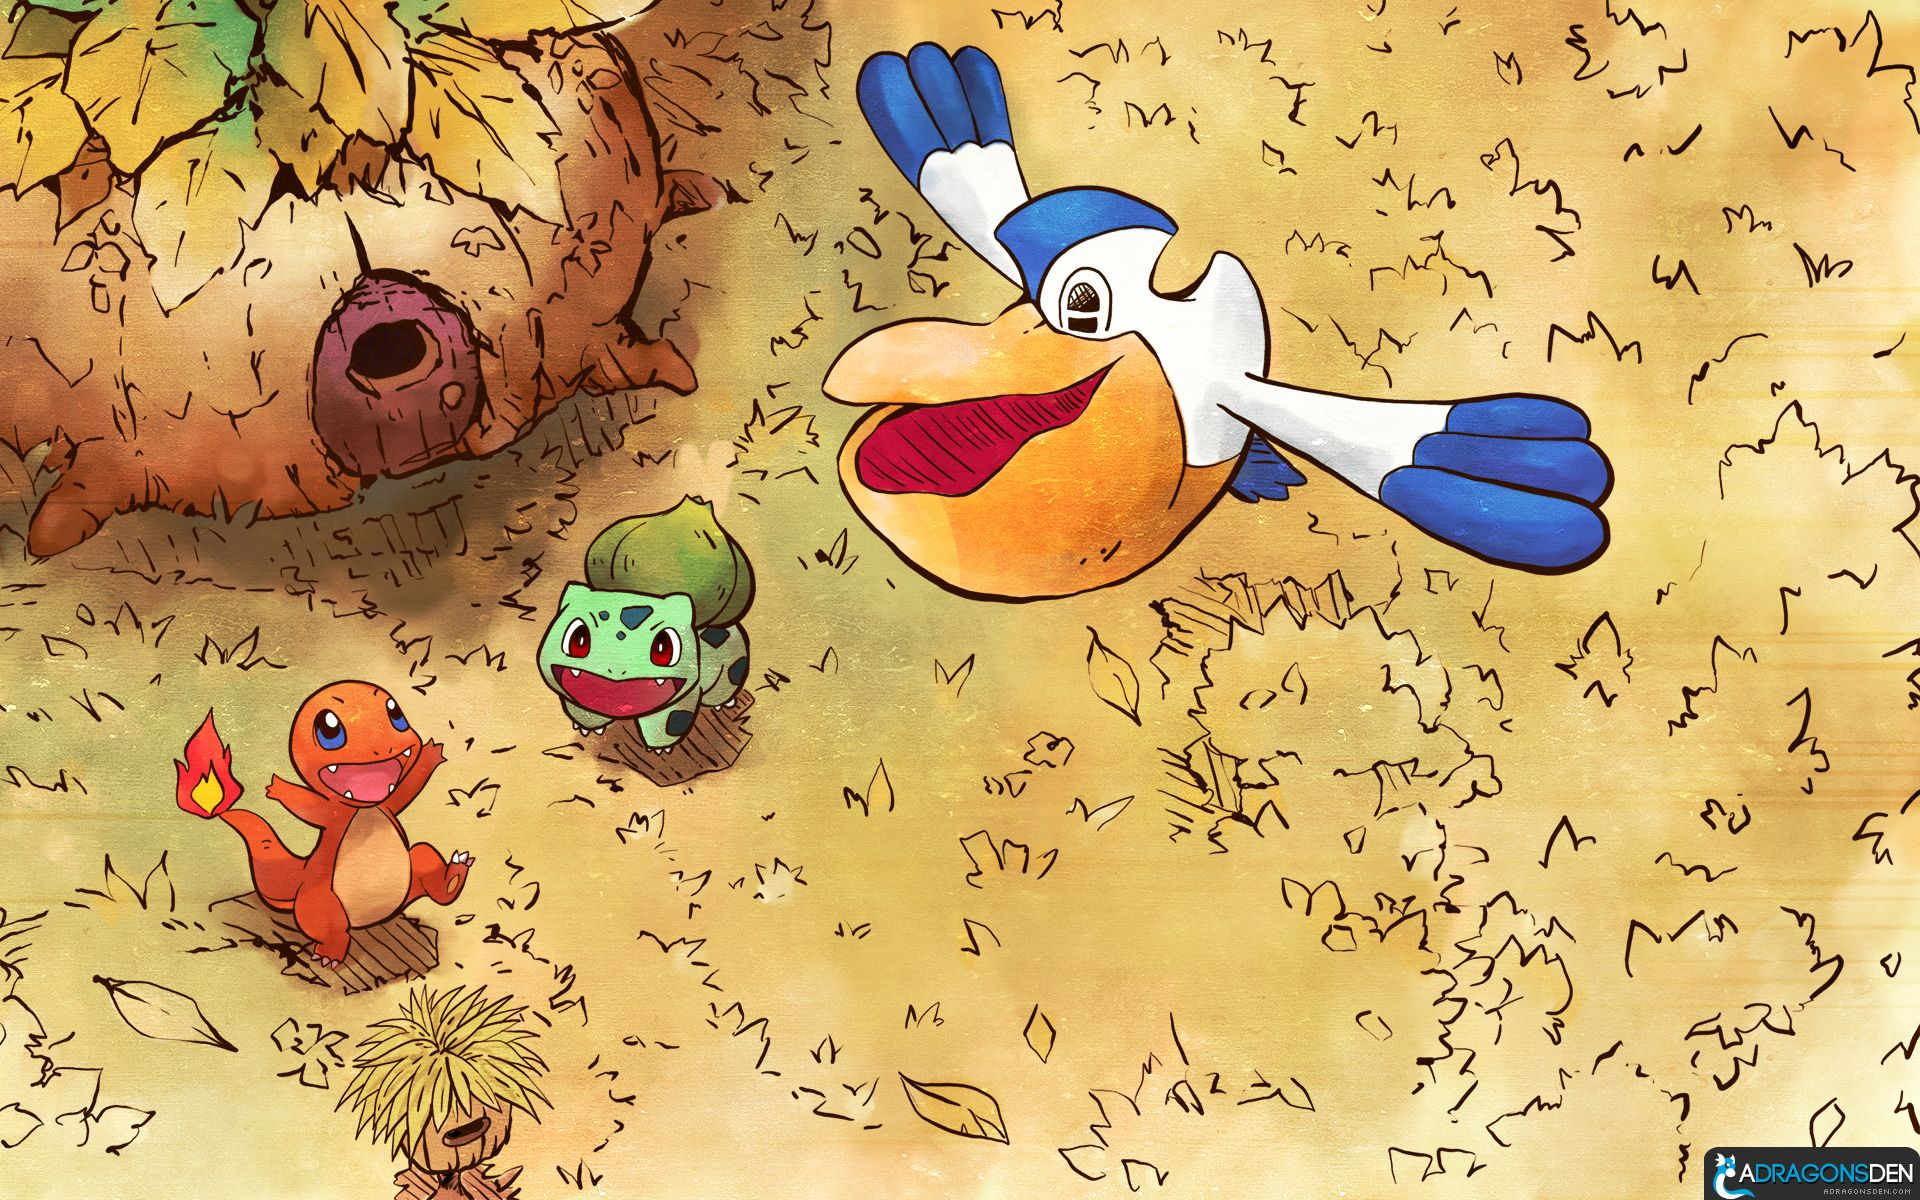 Pmd Wallpaper 2 By Lvstarlitsky On Deviantart Pokemon Wallpaper Pokemon Art